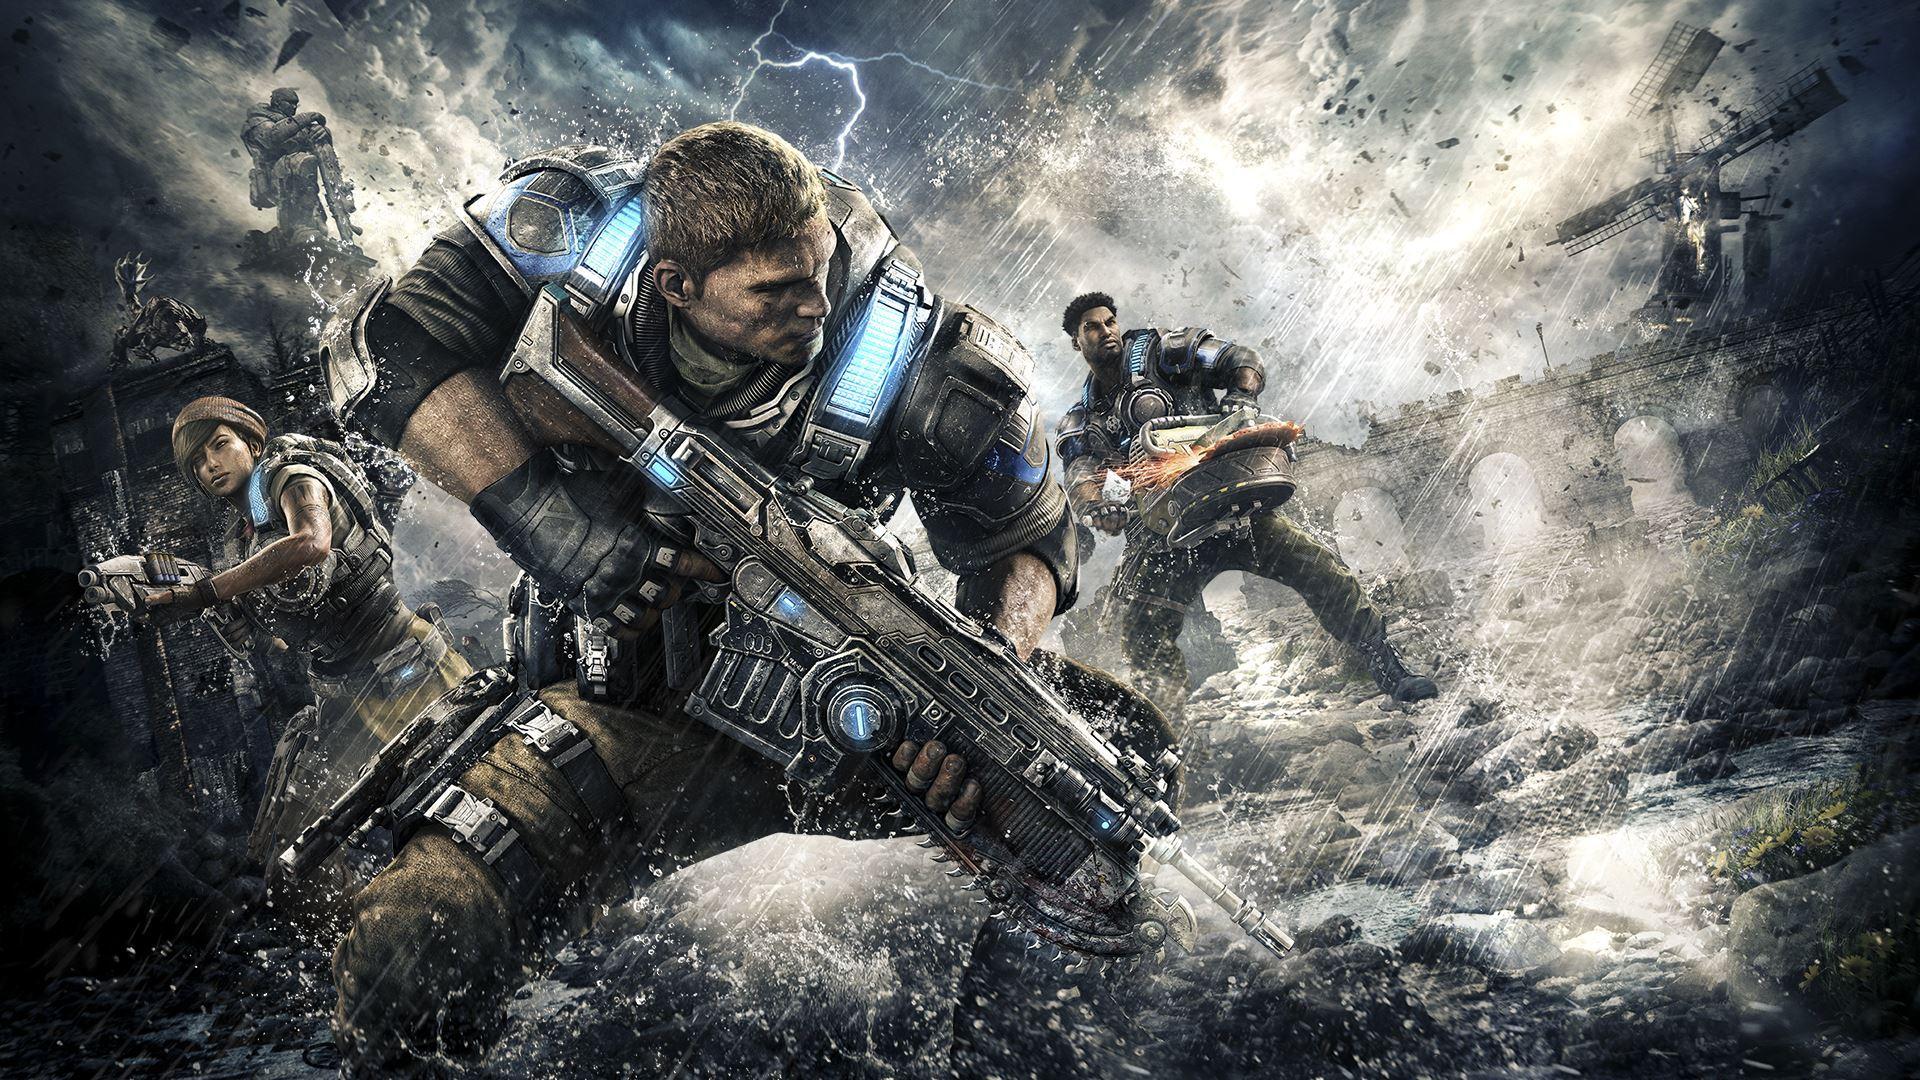 Gears Of War 4 Xbox Live/Win10 Key | Region Free | Multilanguage